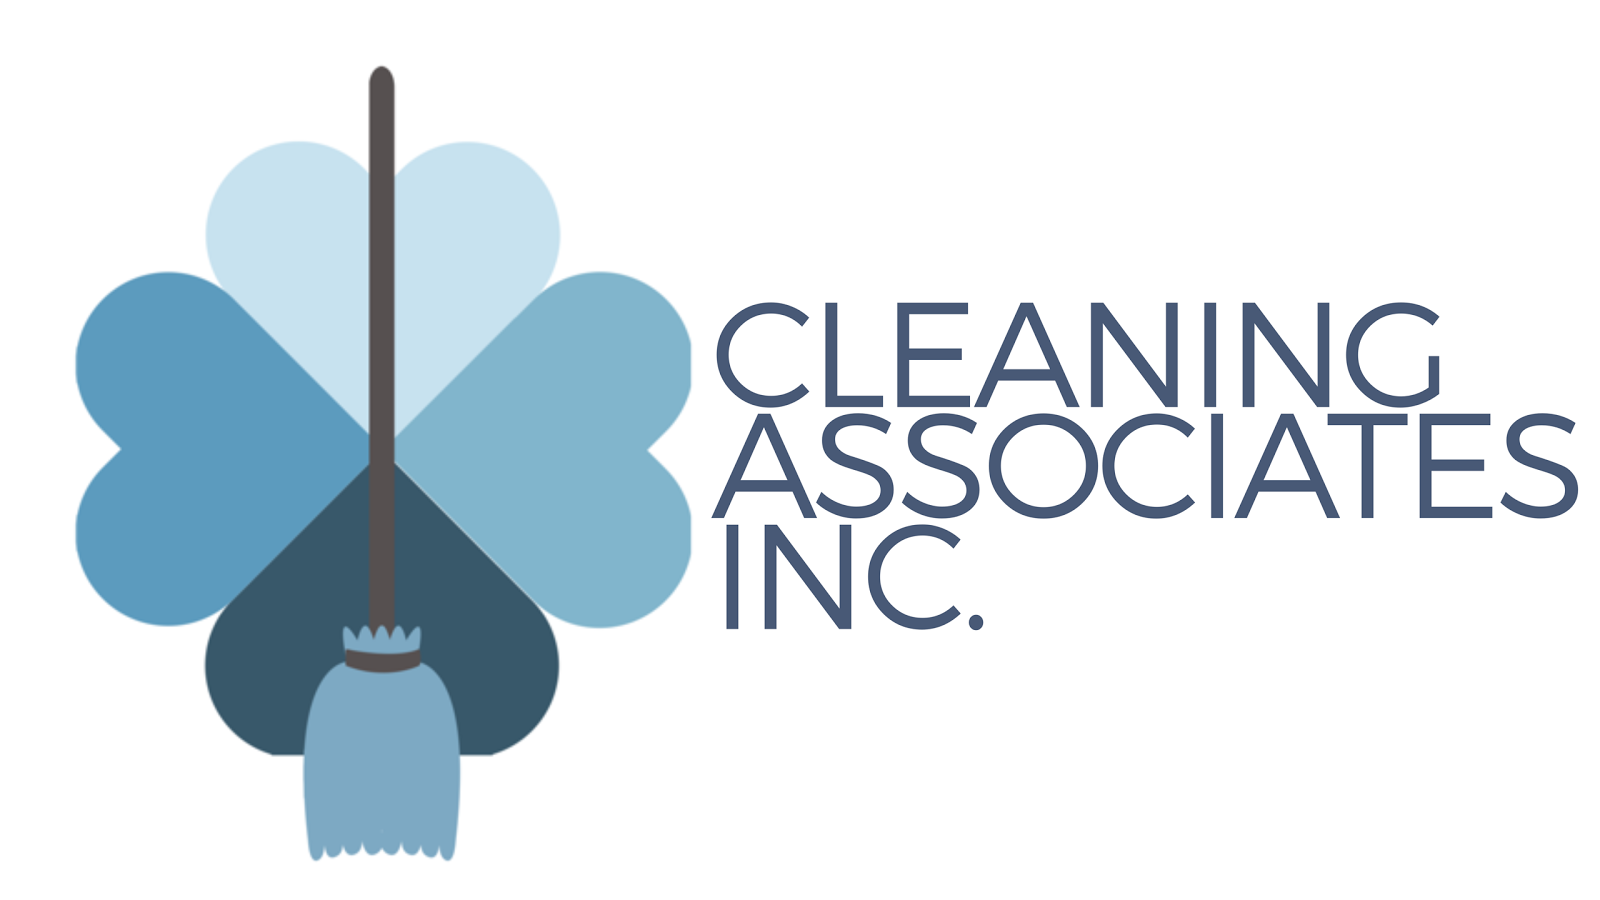 Cleaning Associates Inc